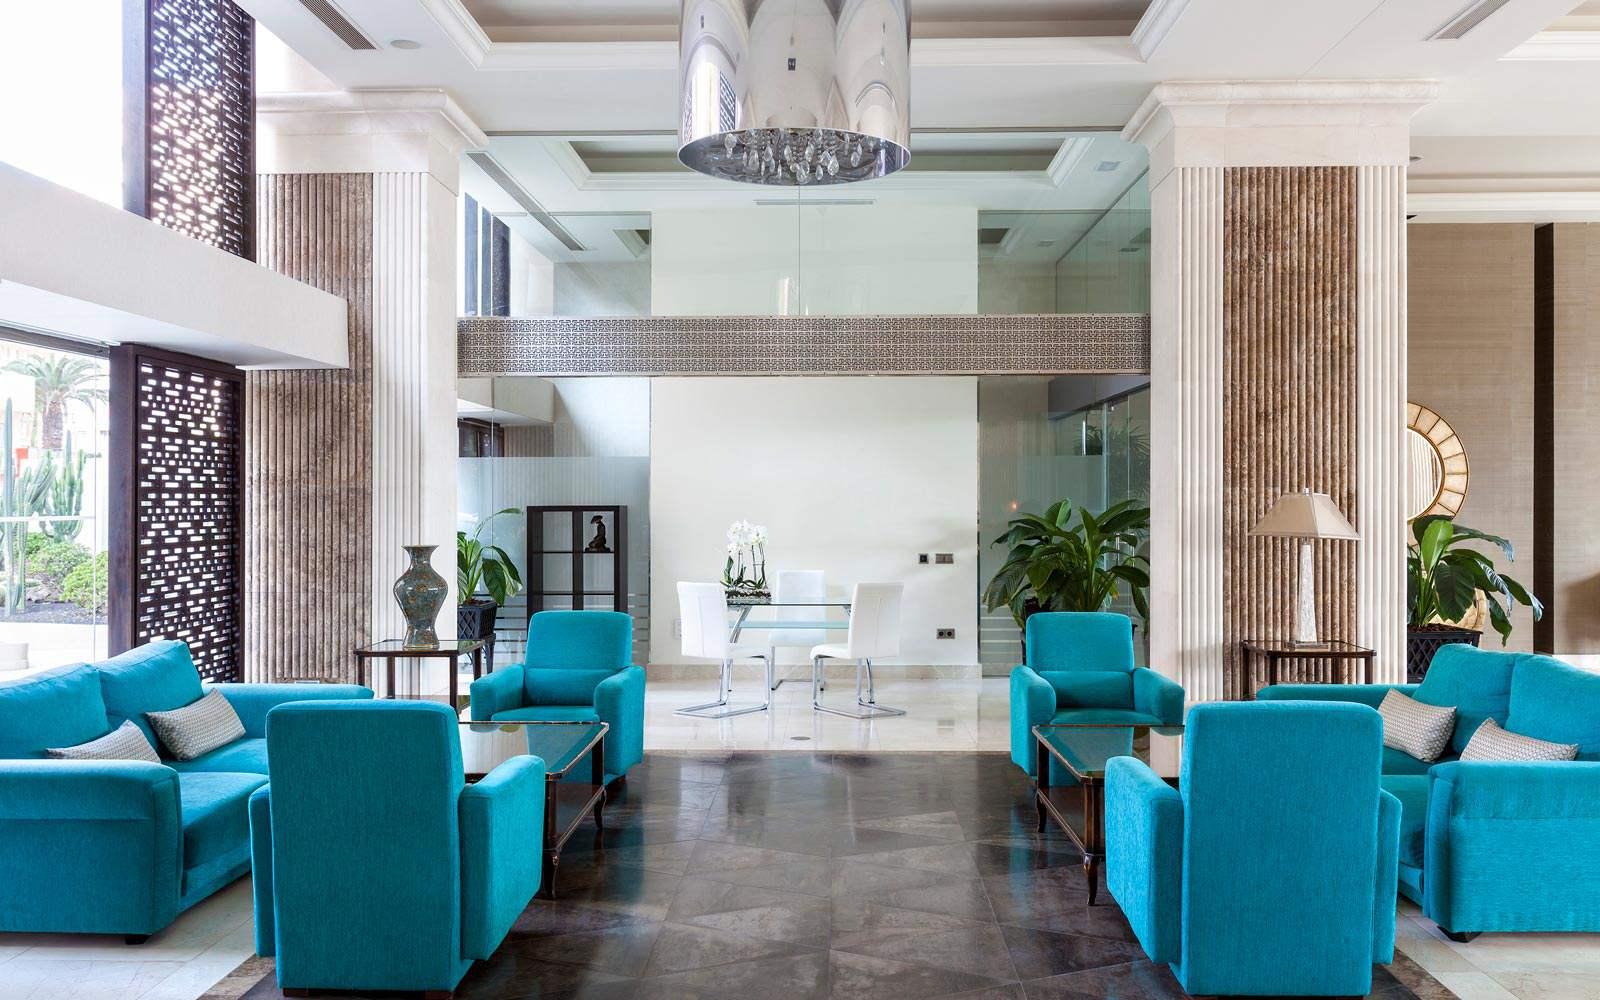 Sol Costa Atlantis Lobby